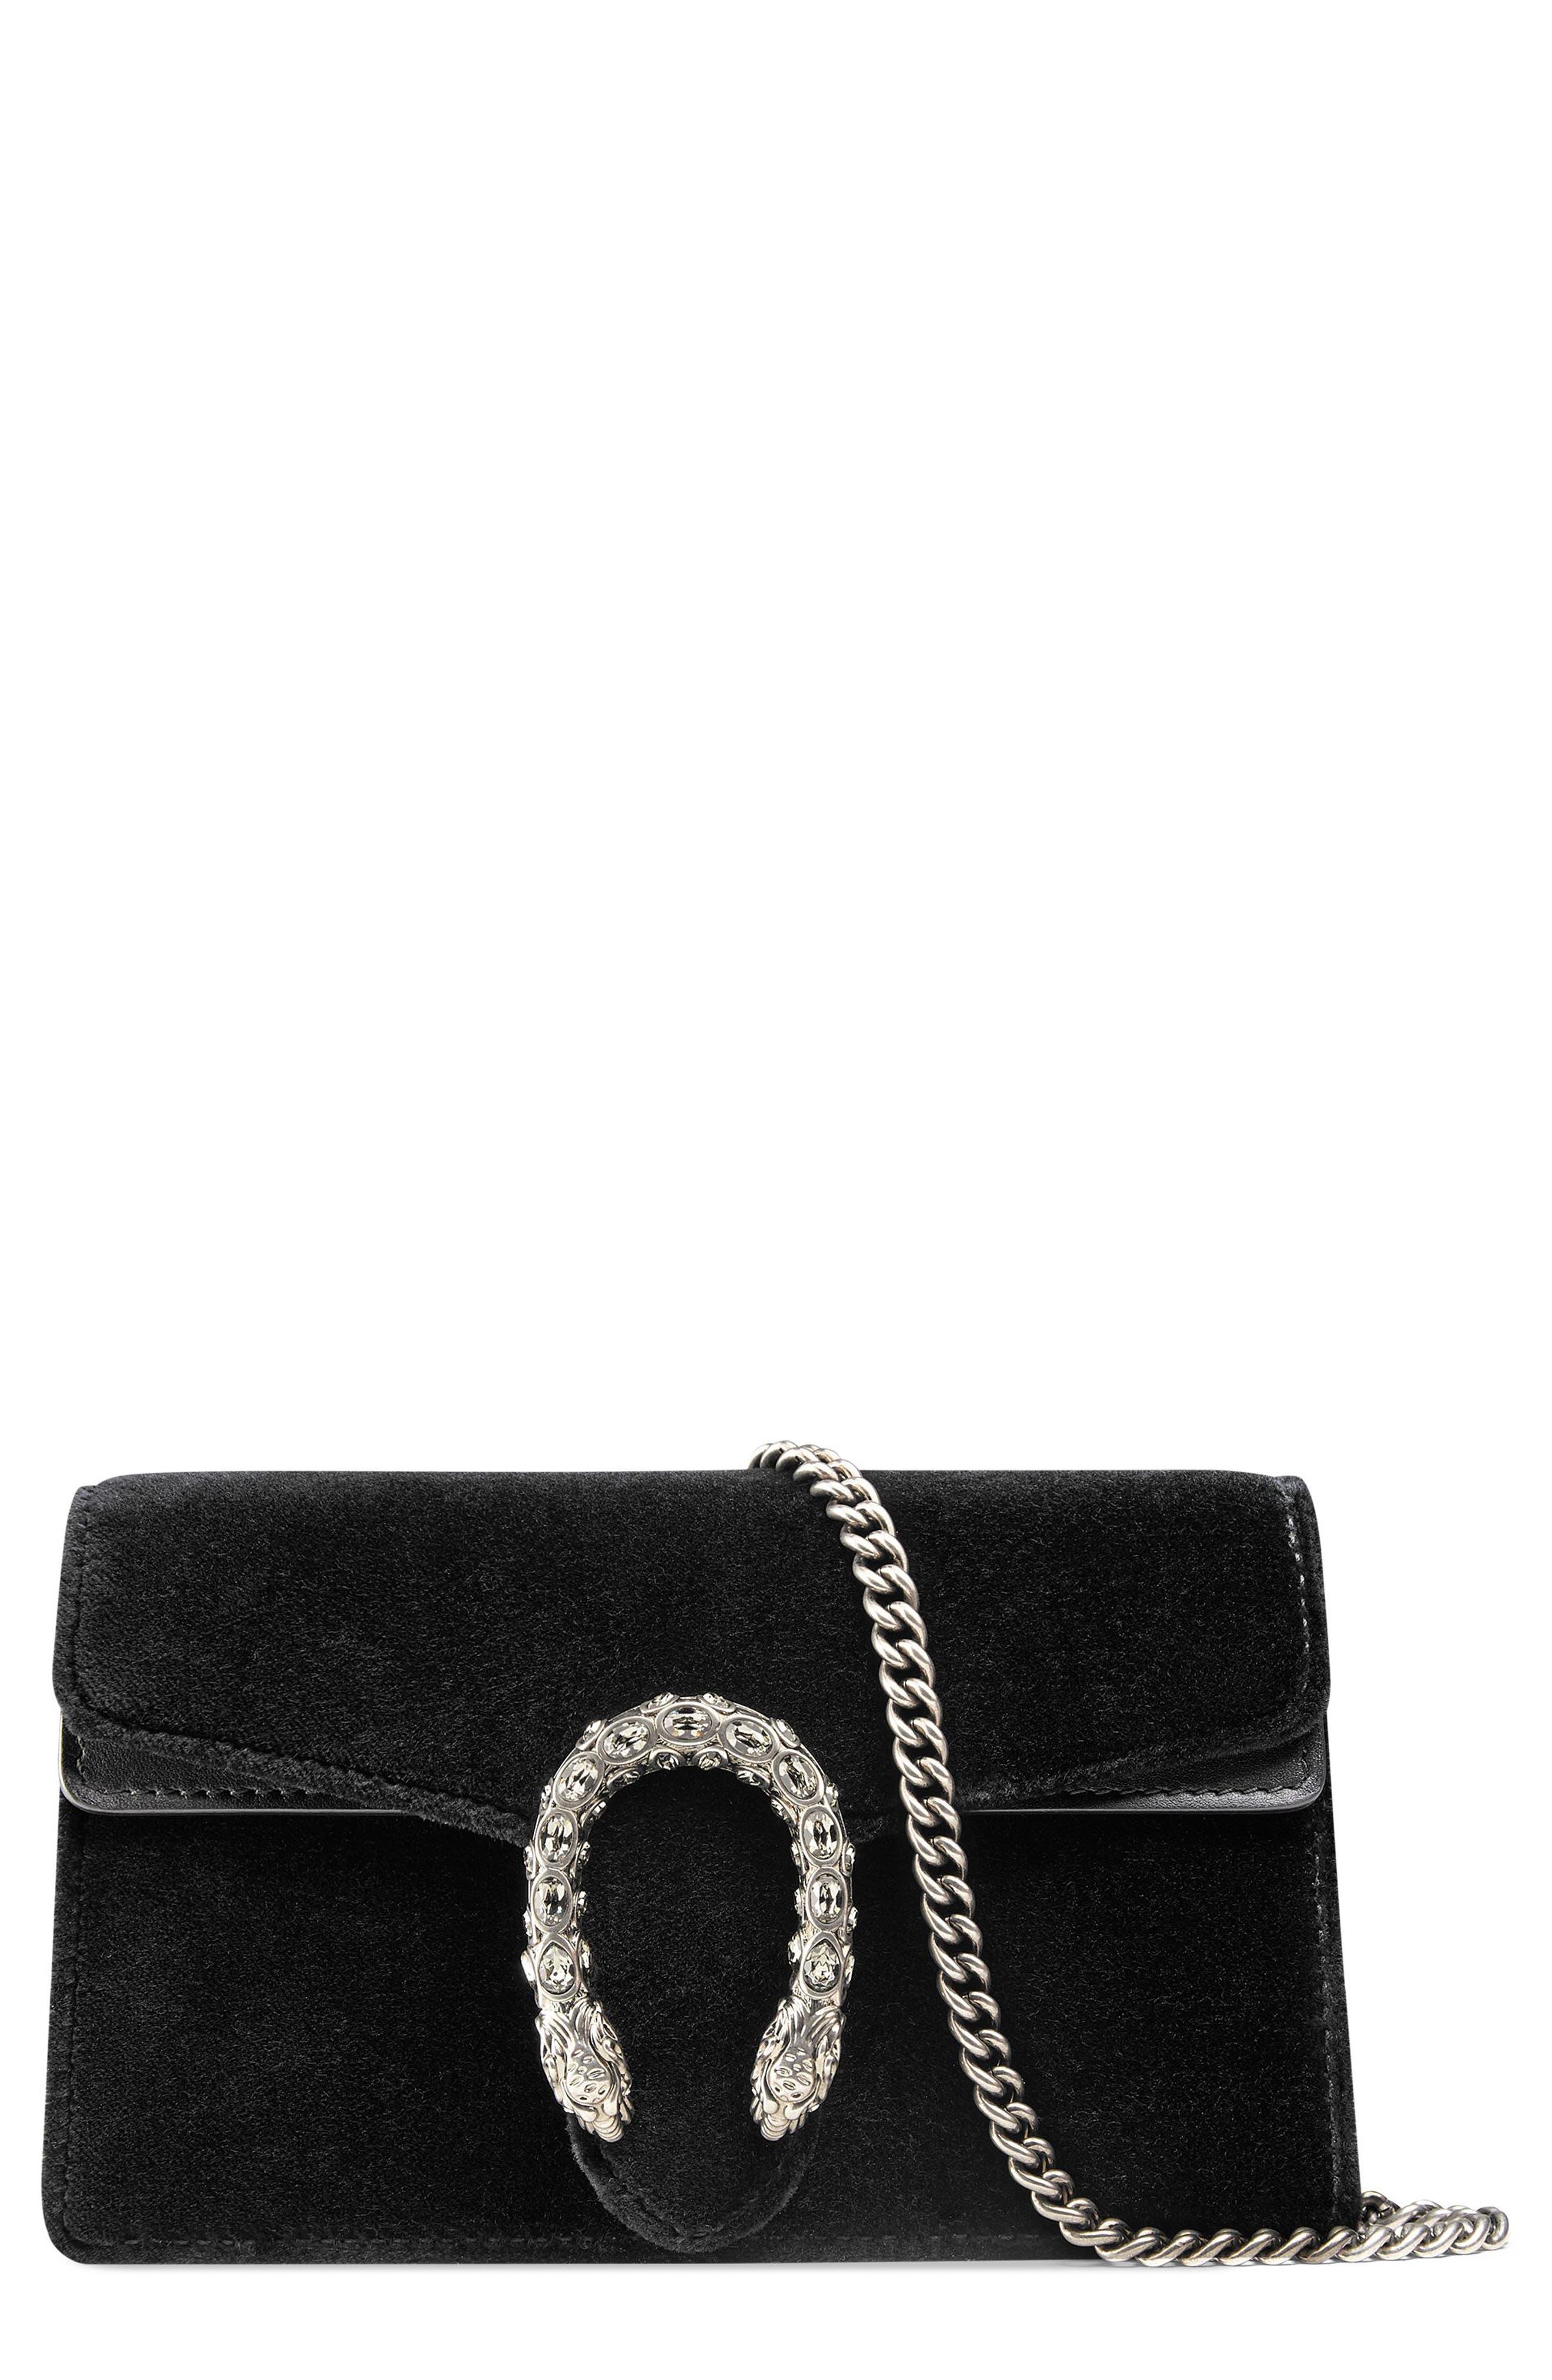 Main Image - Gucci Super Mini Dionysus Velvet Shoulder Bag